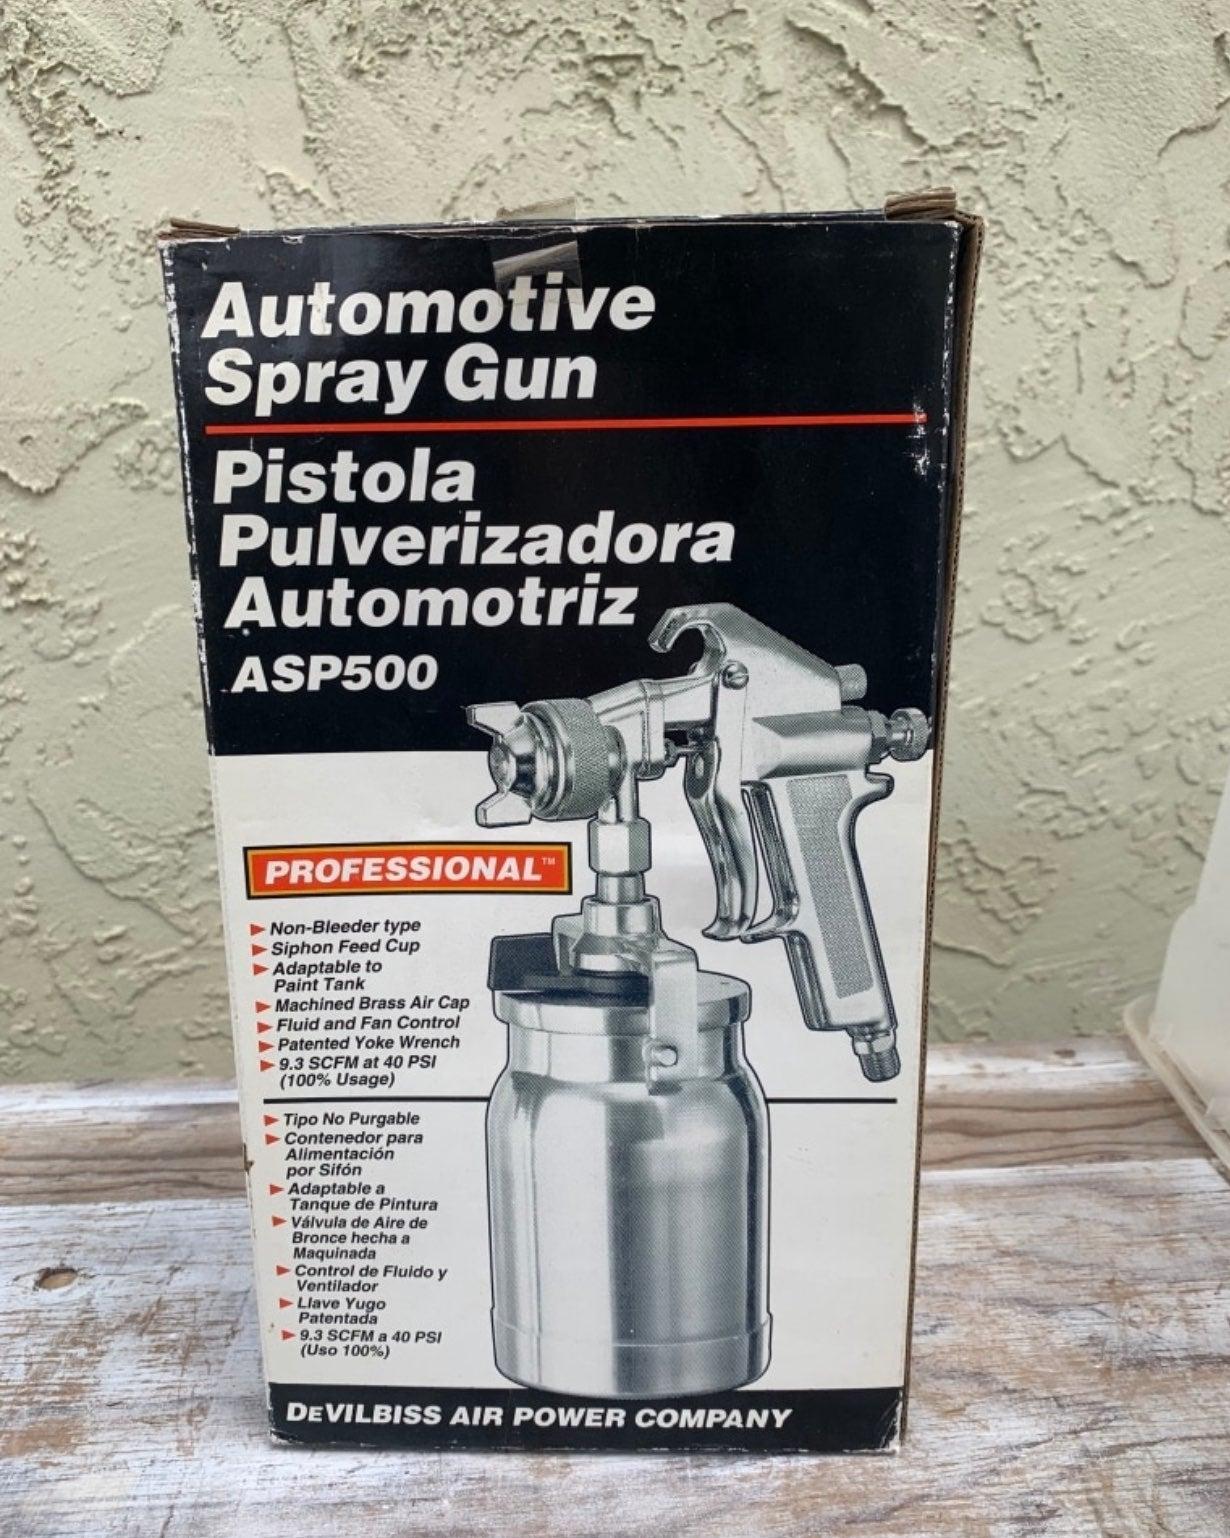 Automotive spray gun